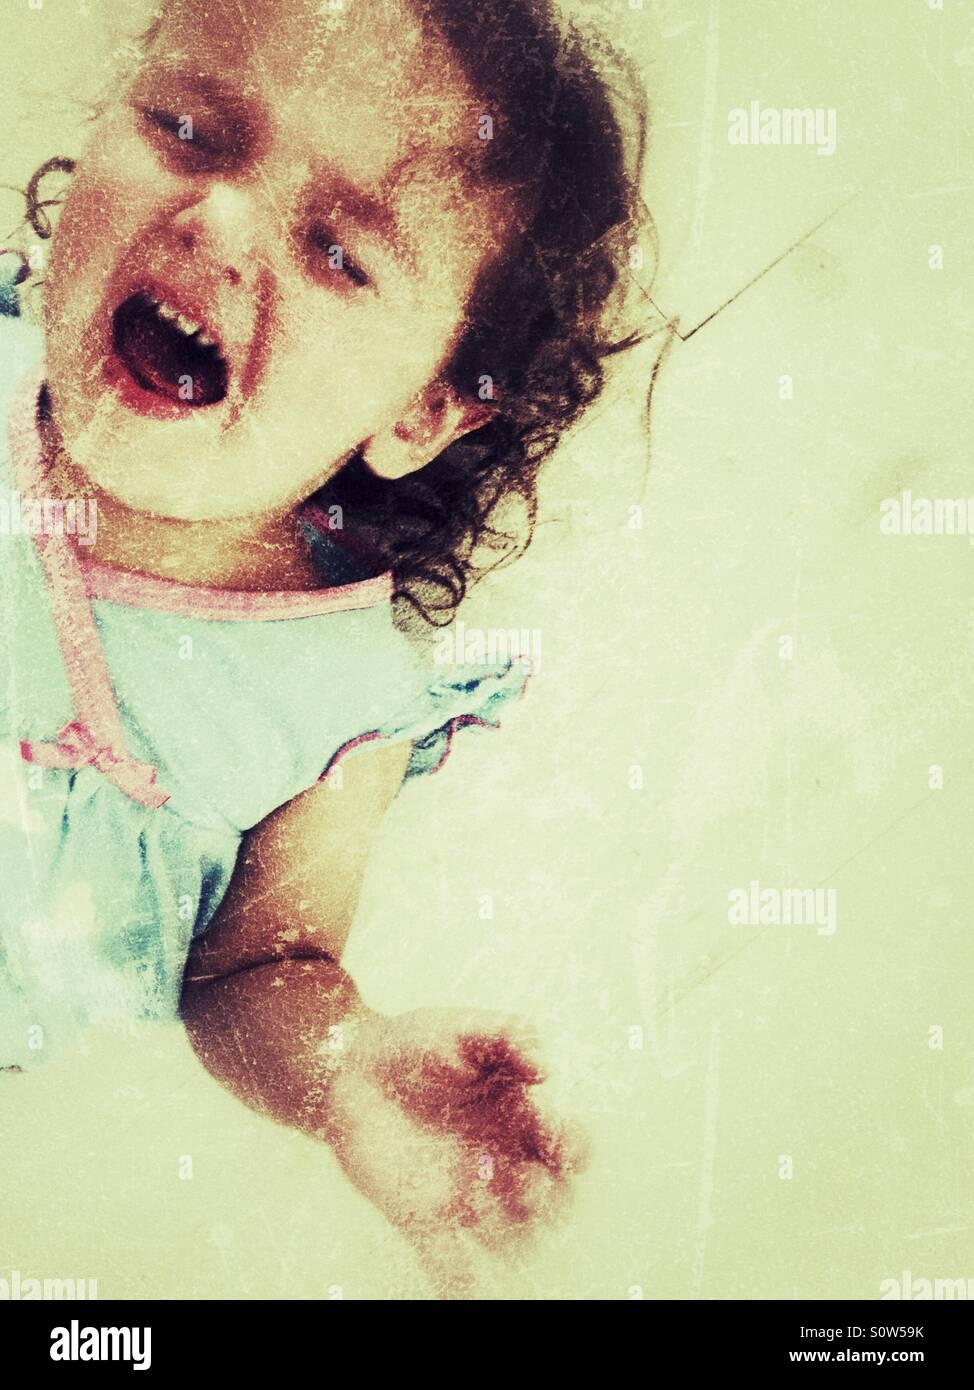 Rabieta de niño pequeño Imagen De Stock